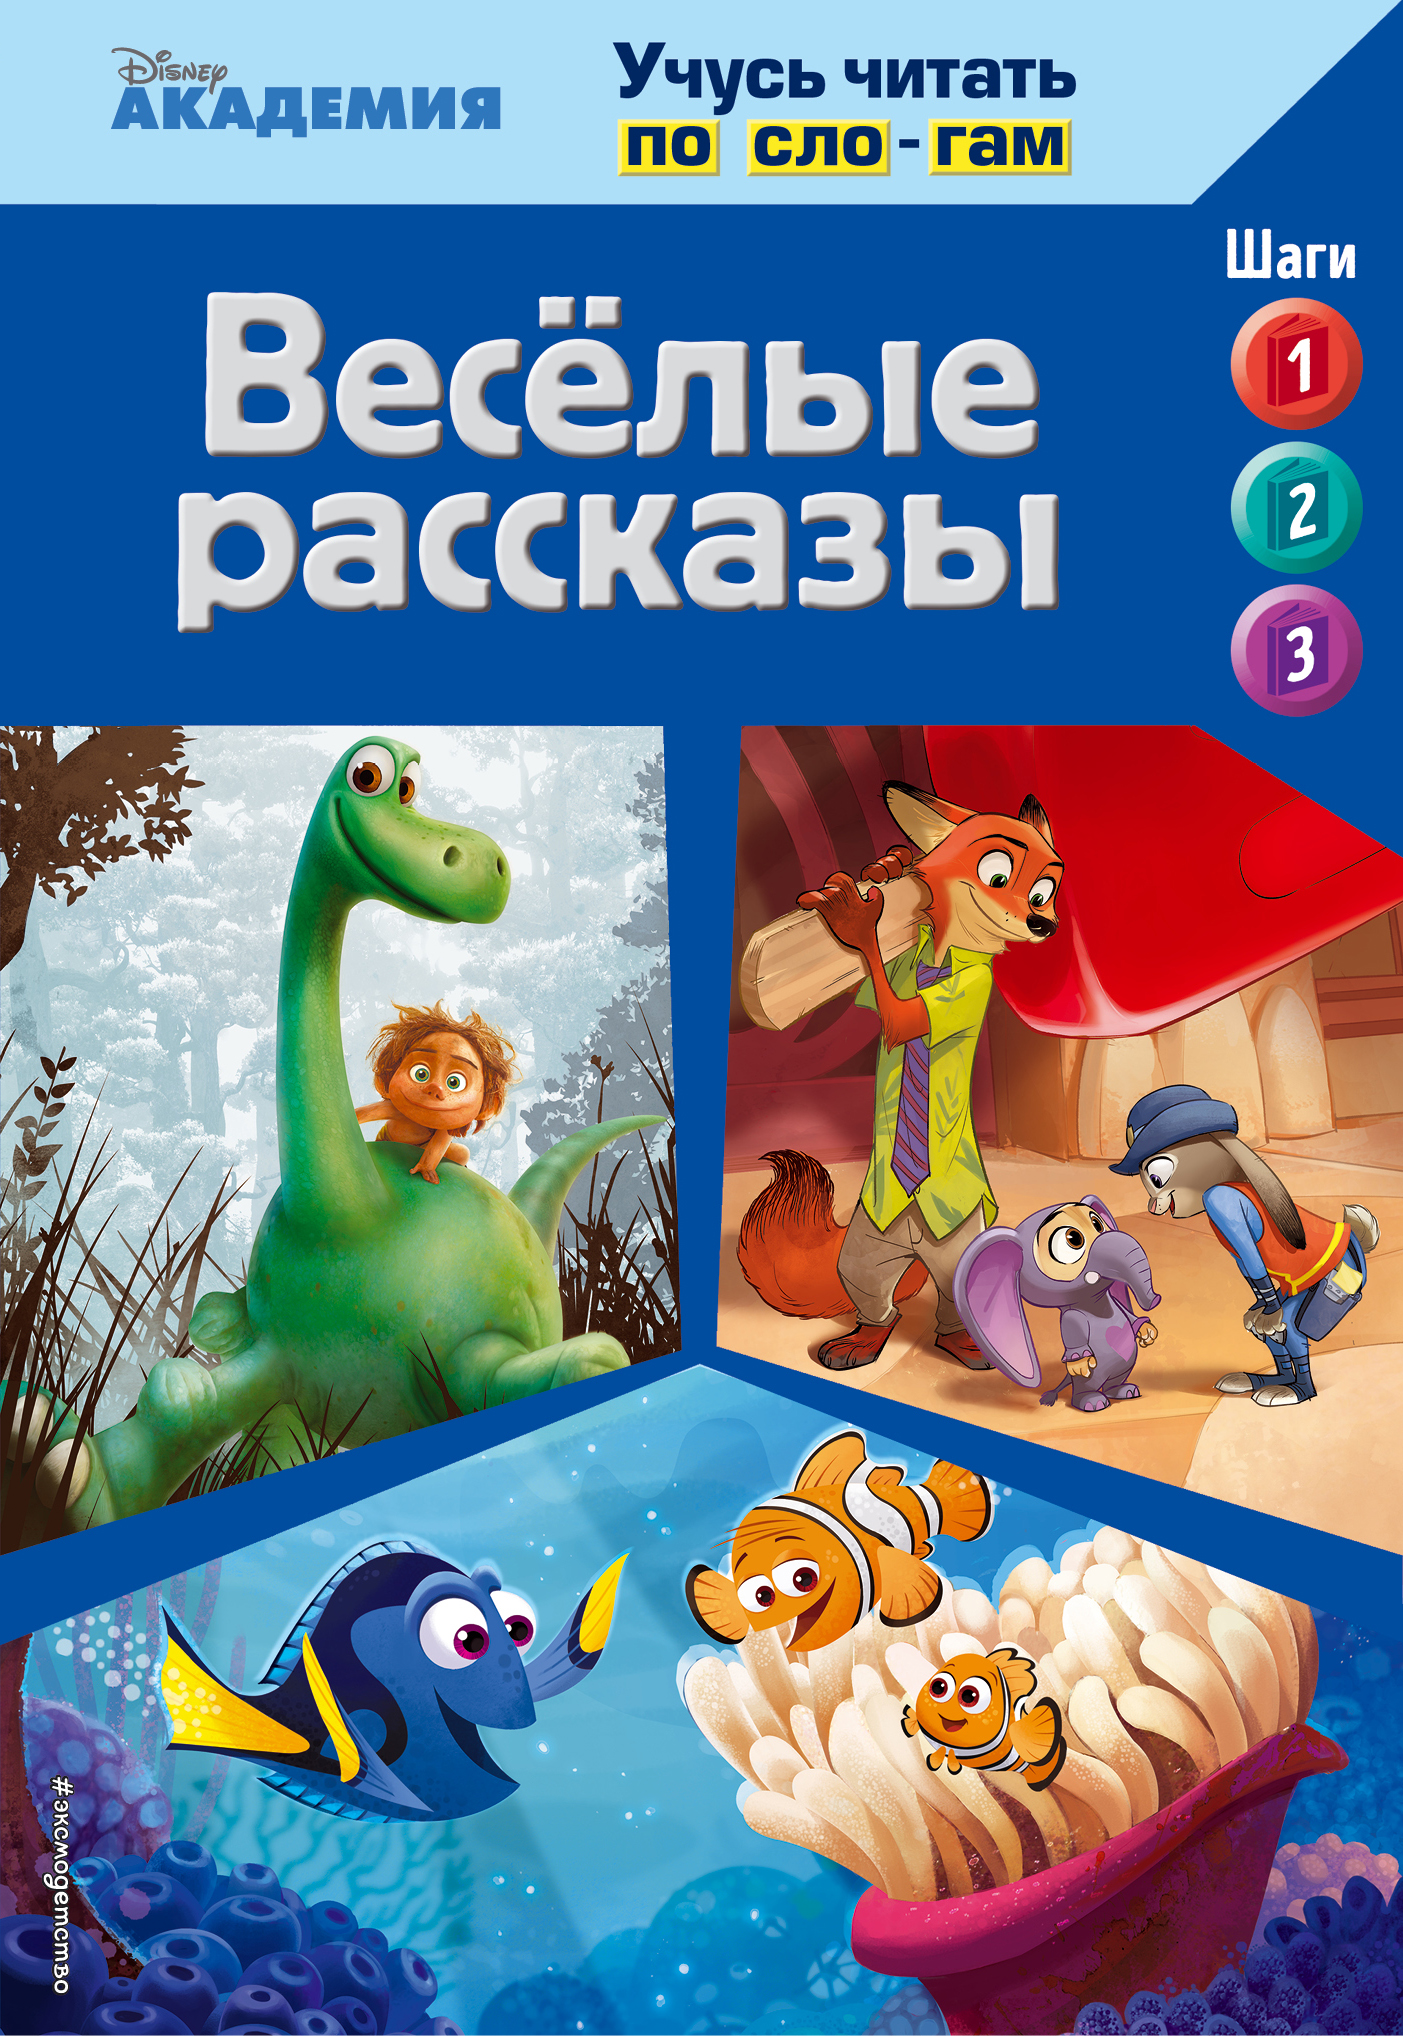 Весёлые рассказы (The Good Dinosaur, Finding Dory, Zootopia)